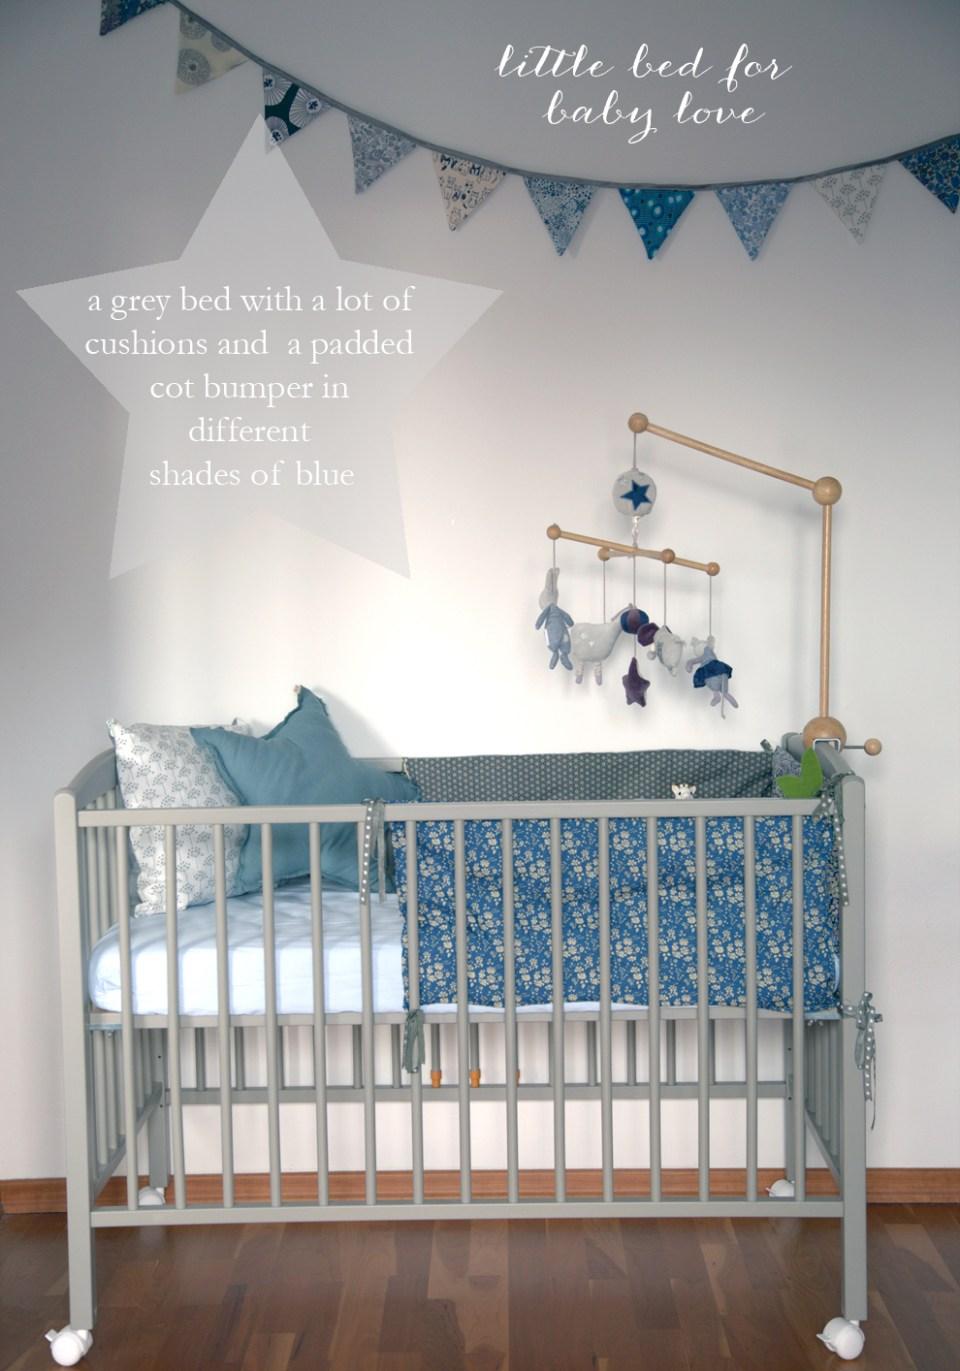 Nursery_bed1